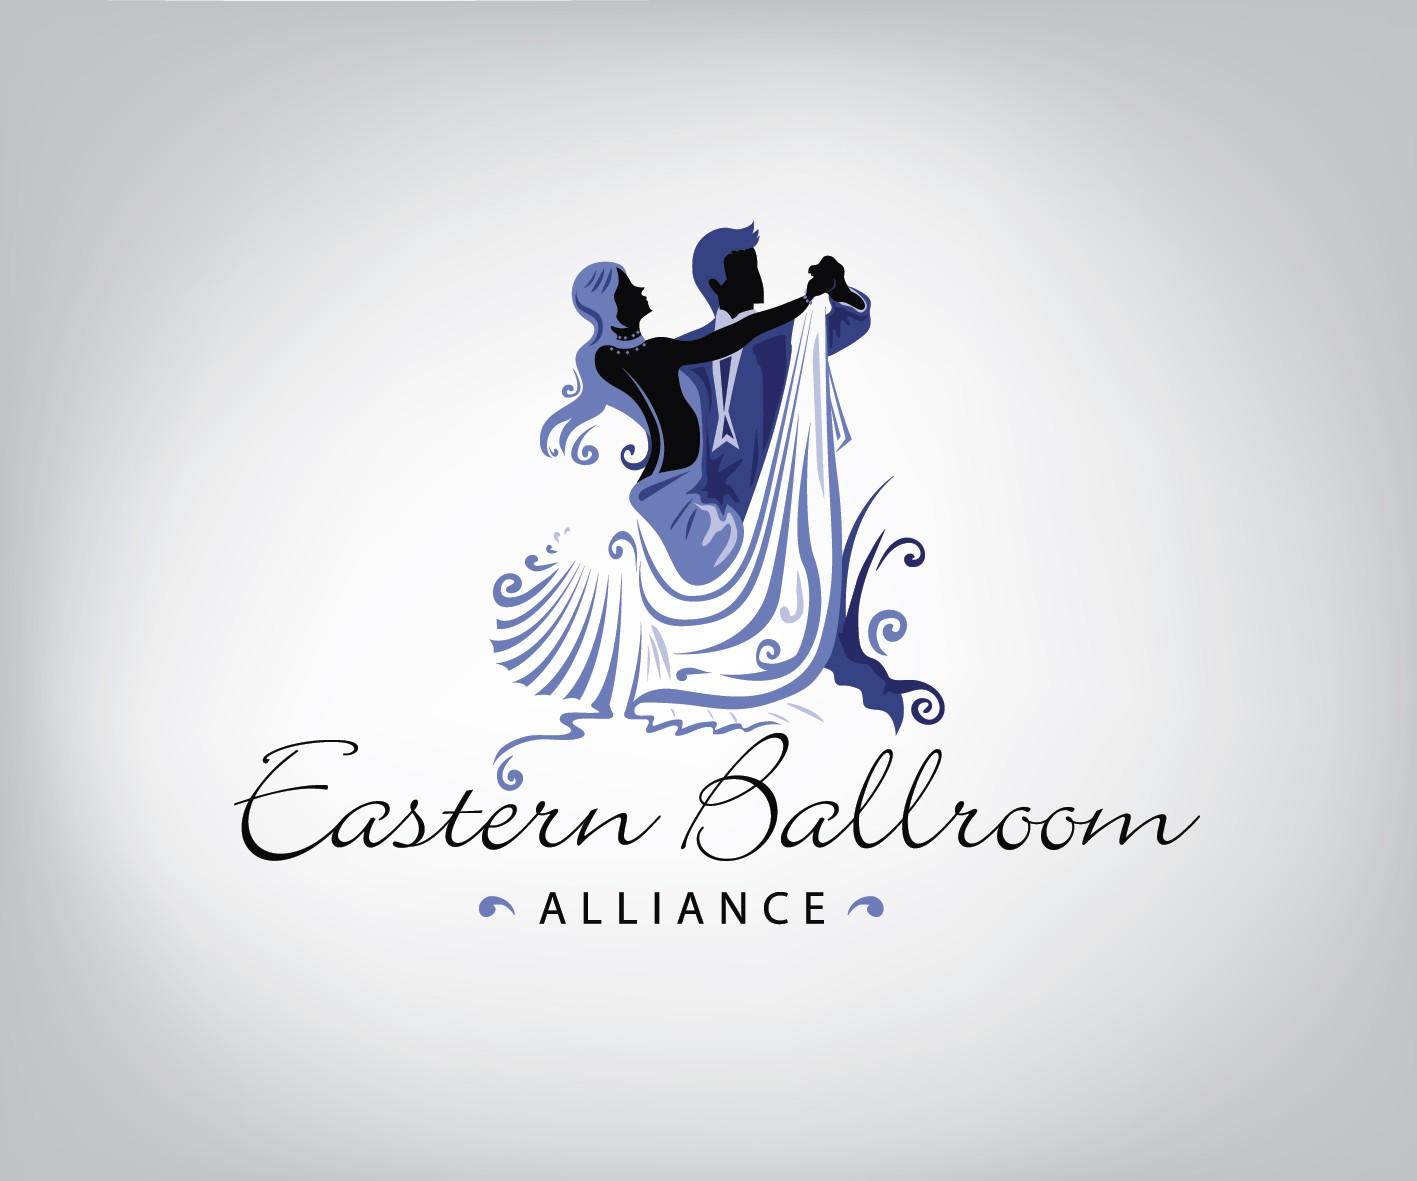 New logo wanted for Eastern Ballroom Alliance